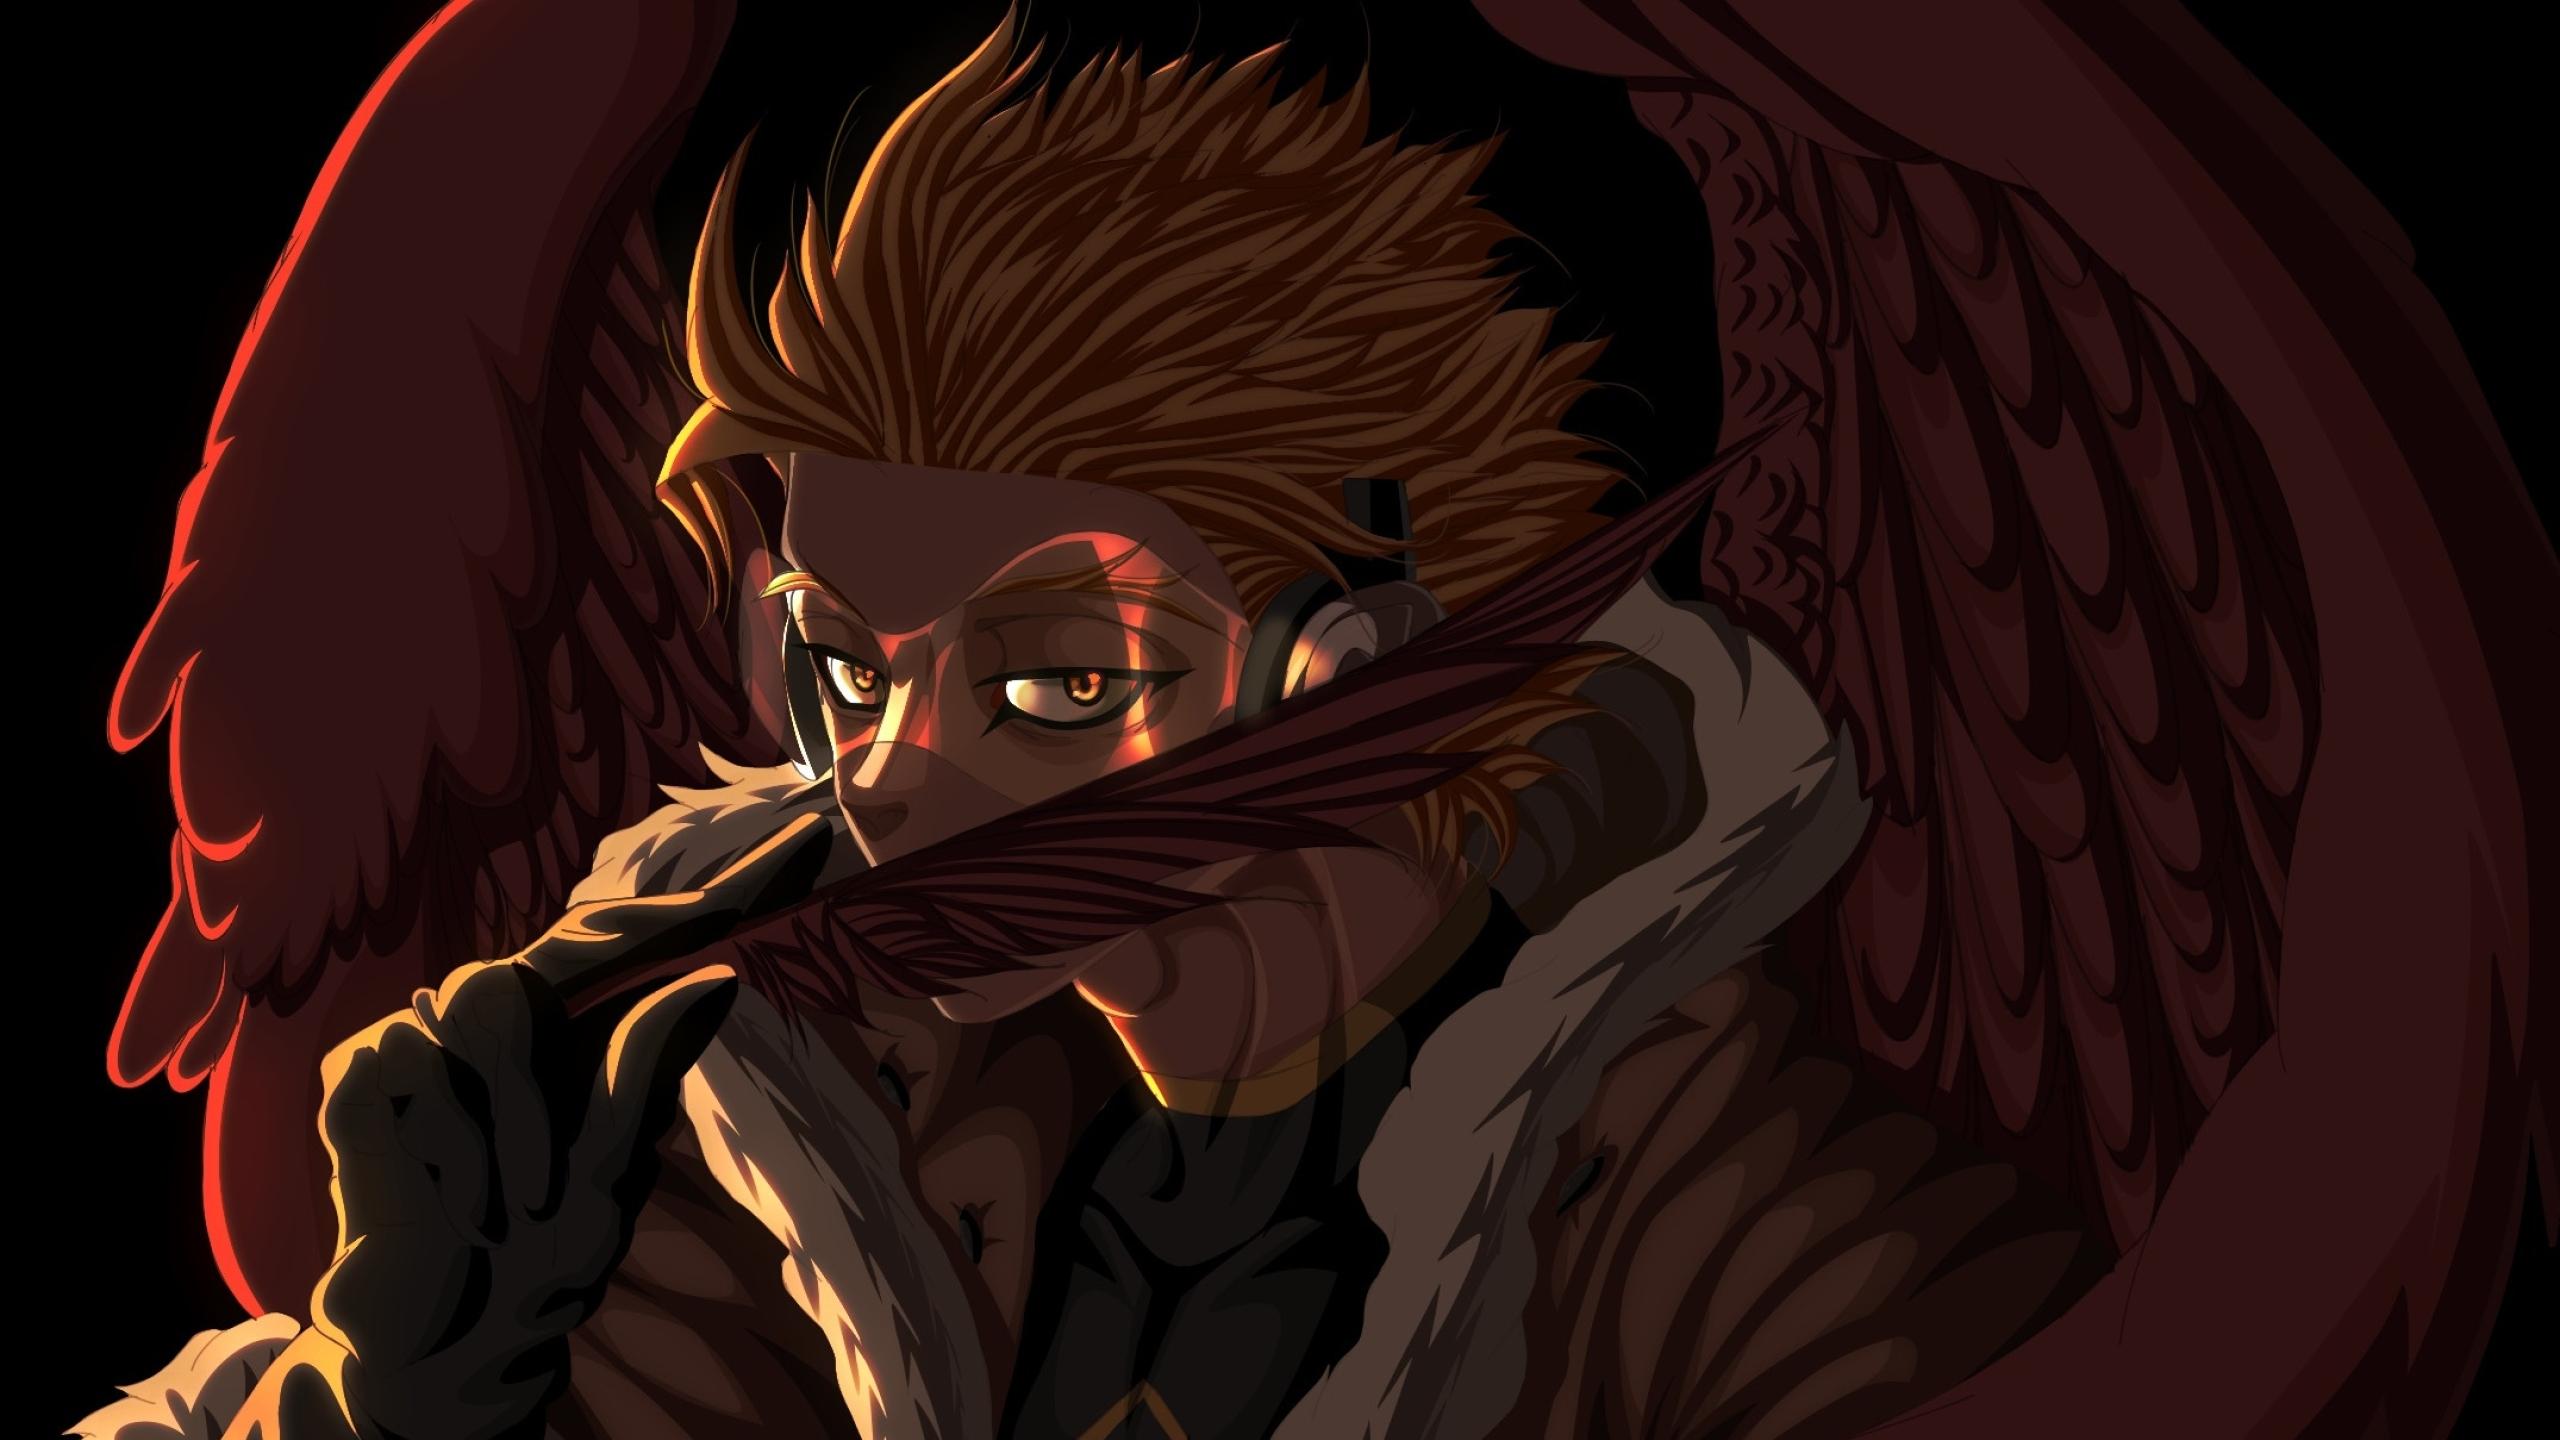 2560x1440 Hawks Boku No Hero Academia 1440p Resolution Wallpaper